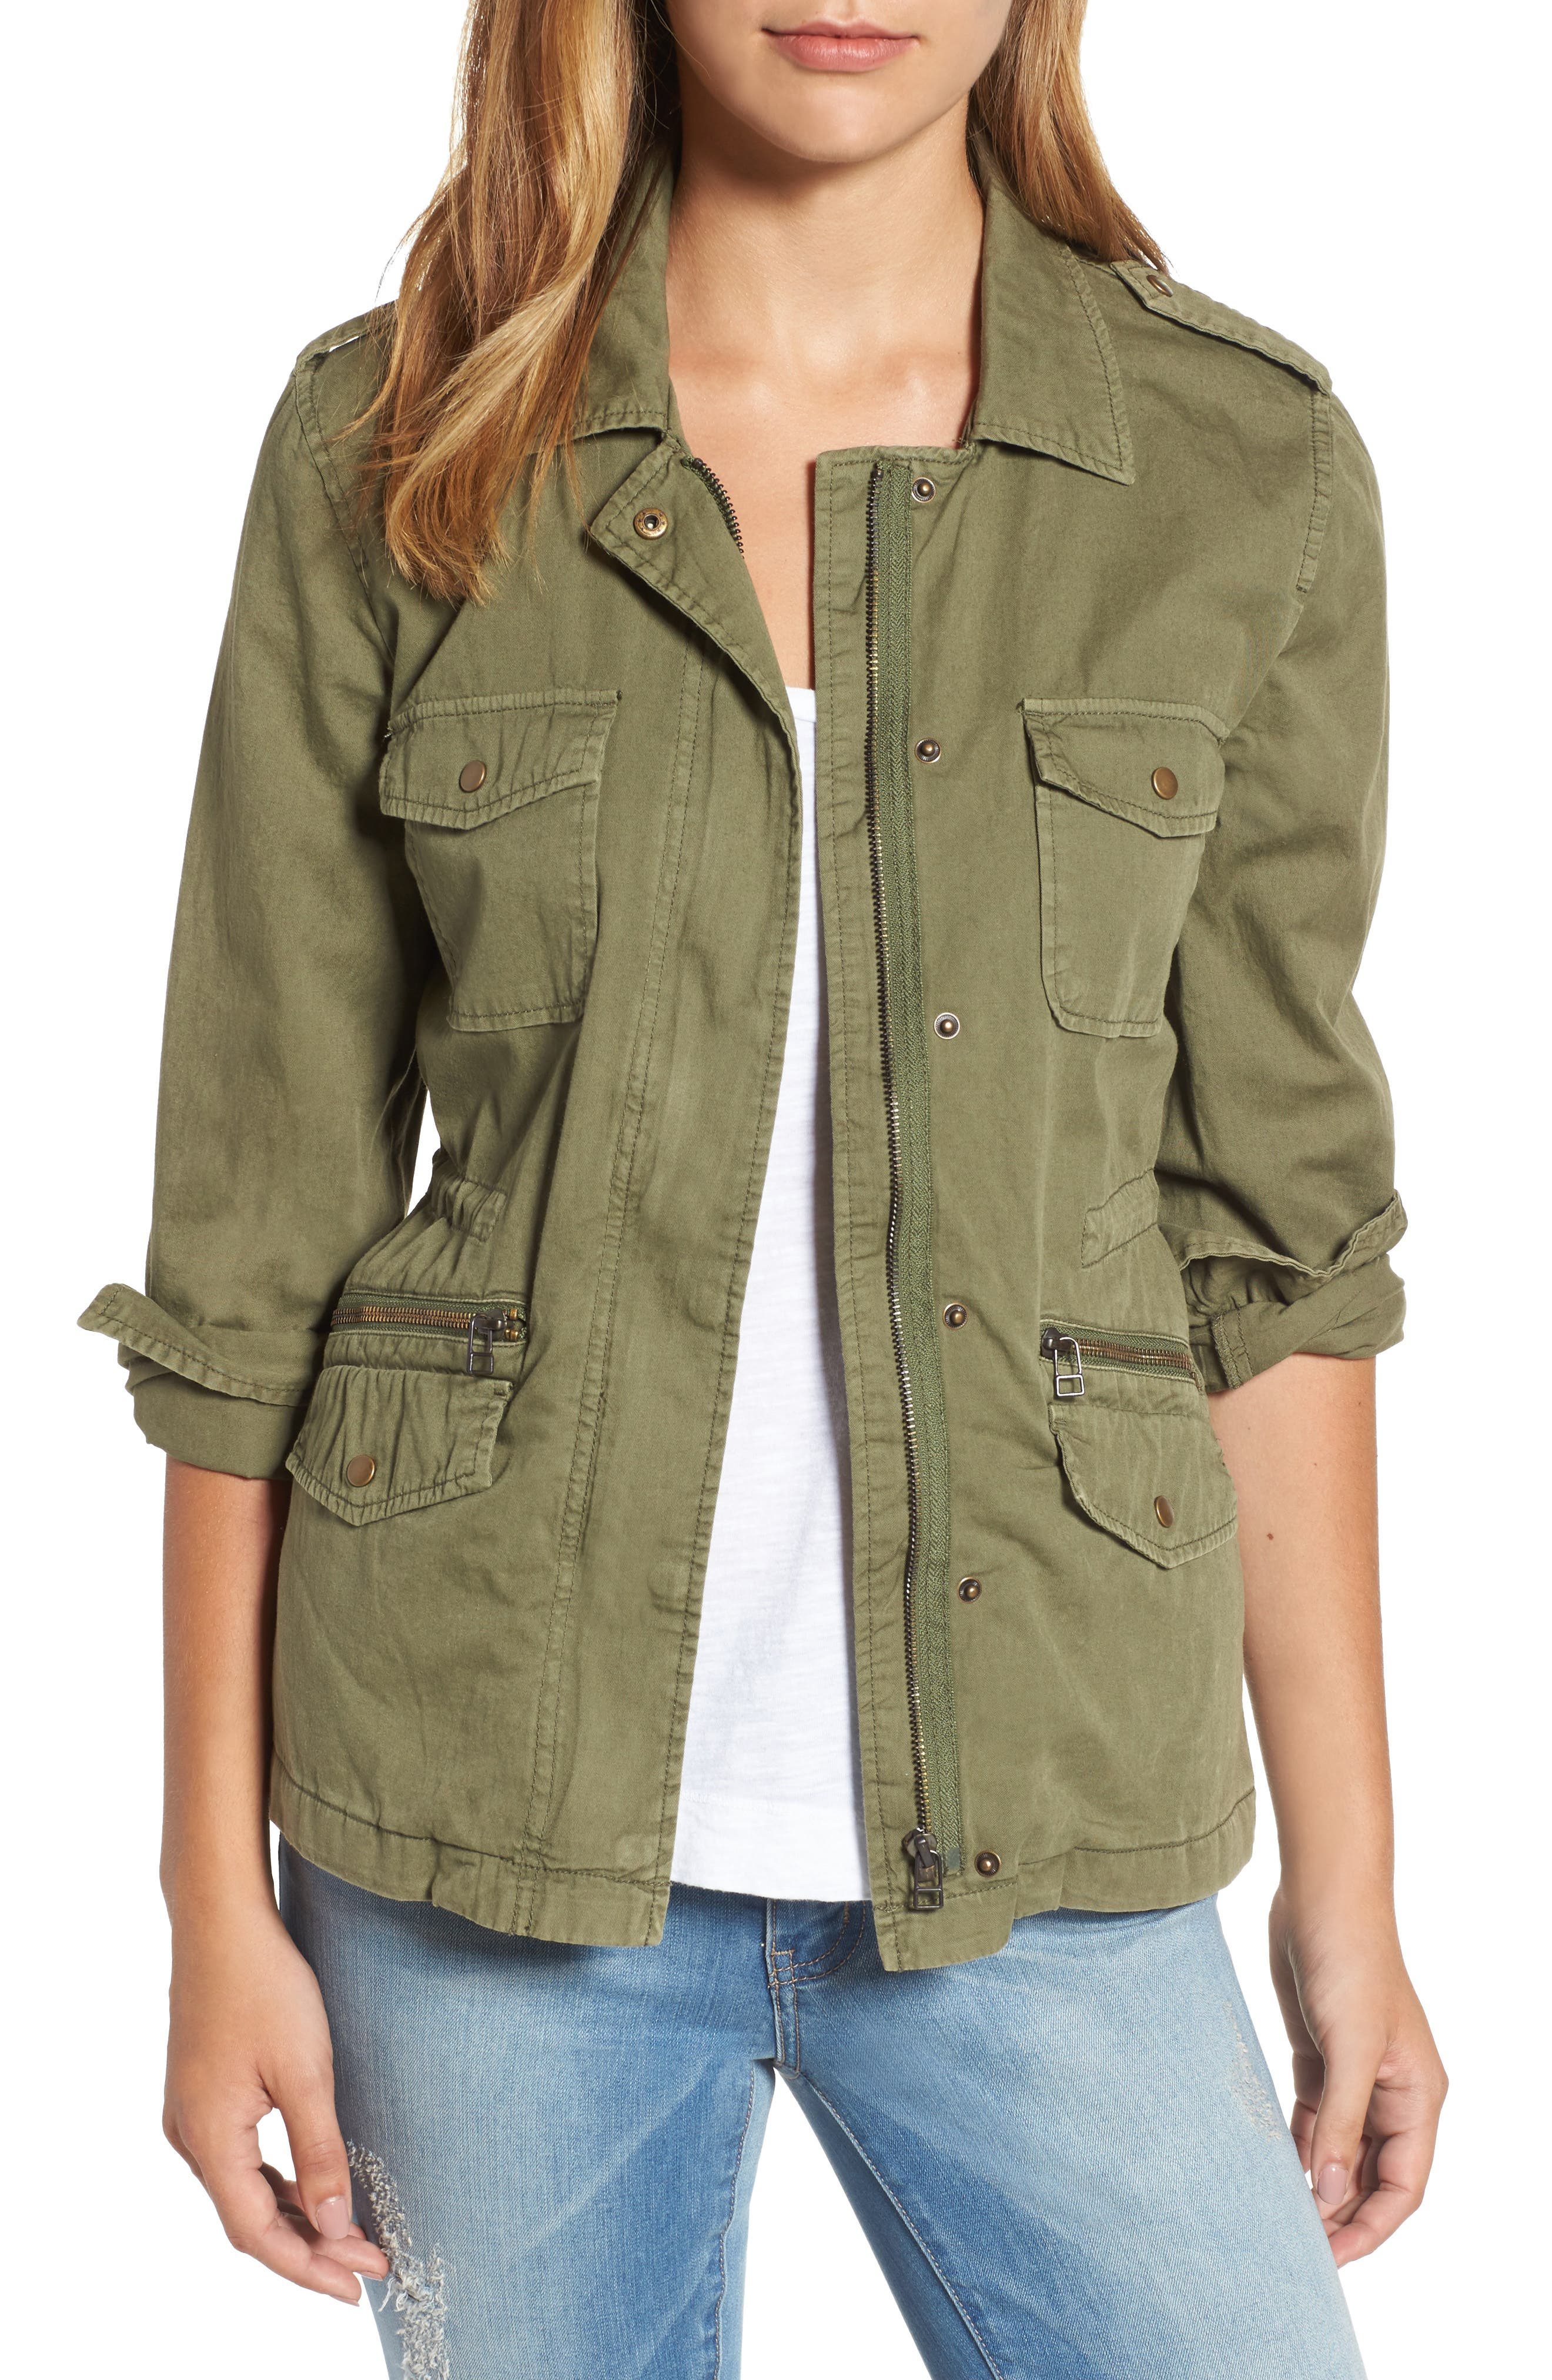 Lily Aldridge for Velvet by Graham & Spencer Army Jacket,                         Main,                         color, FOREST GREEN